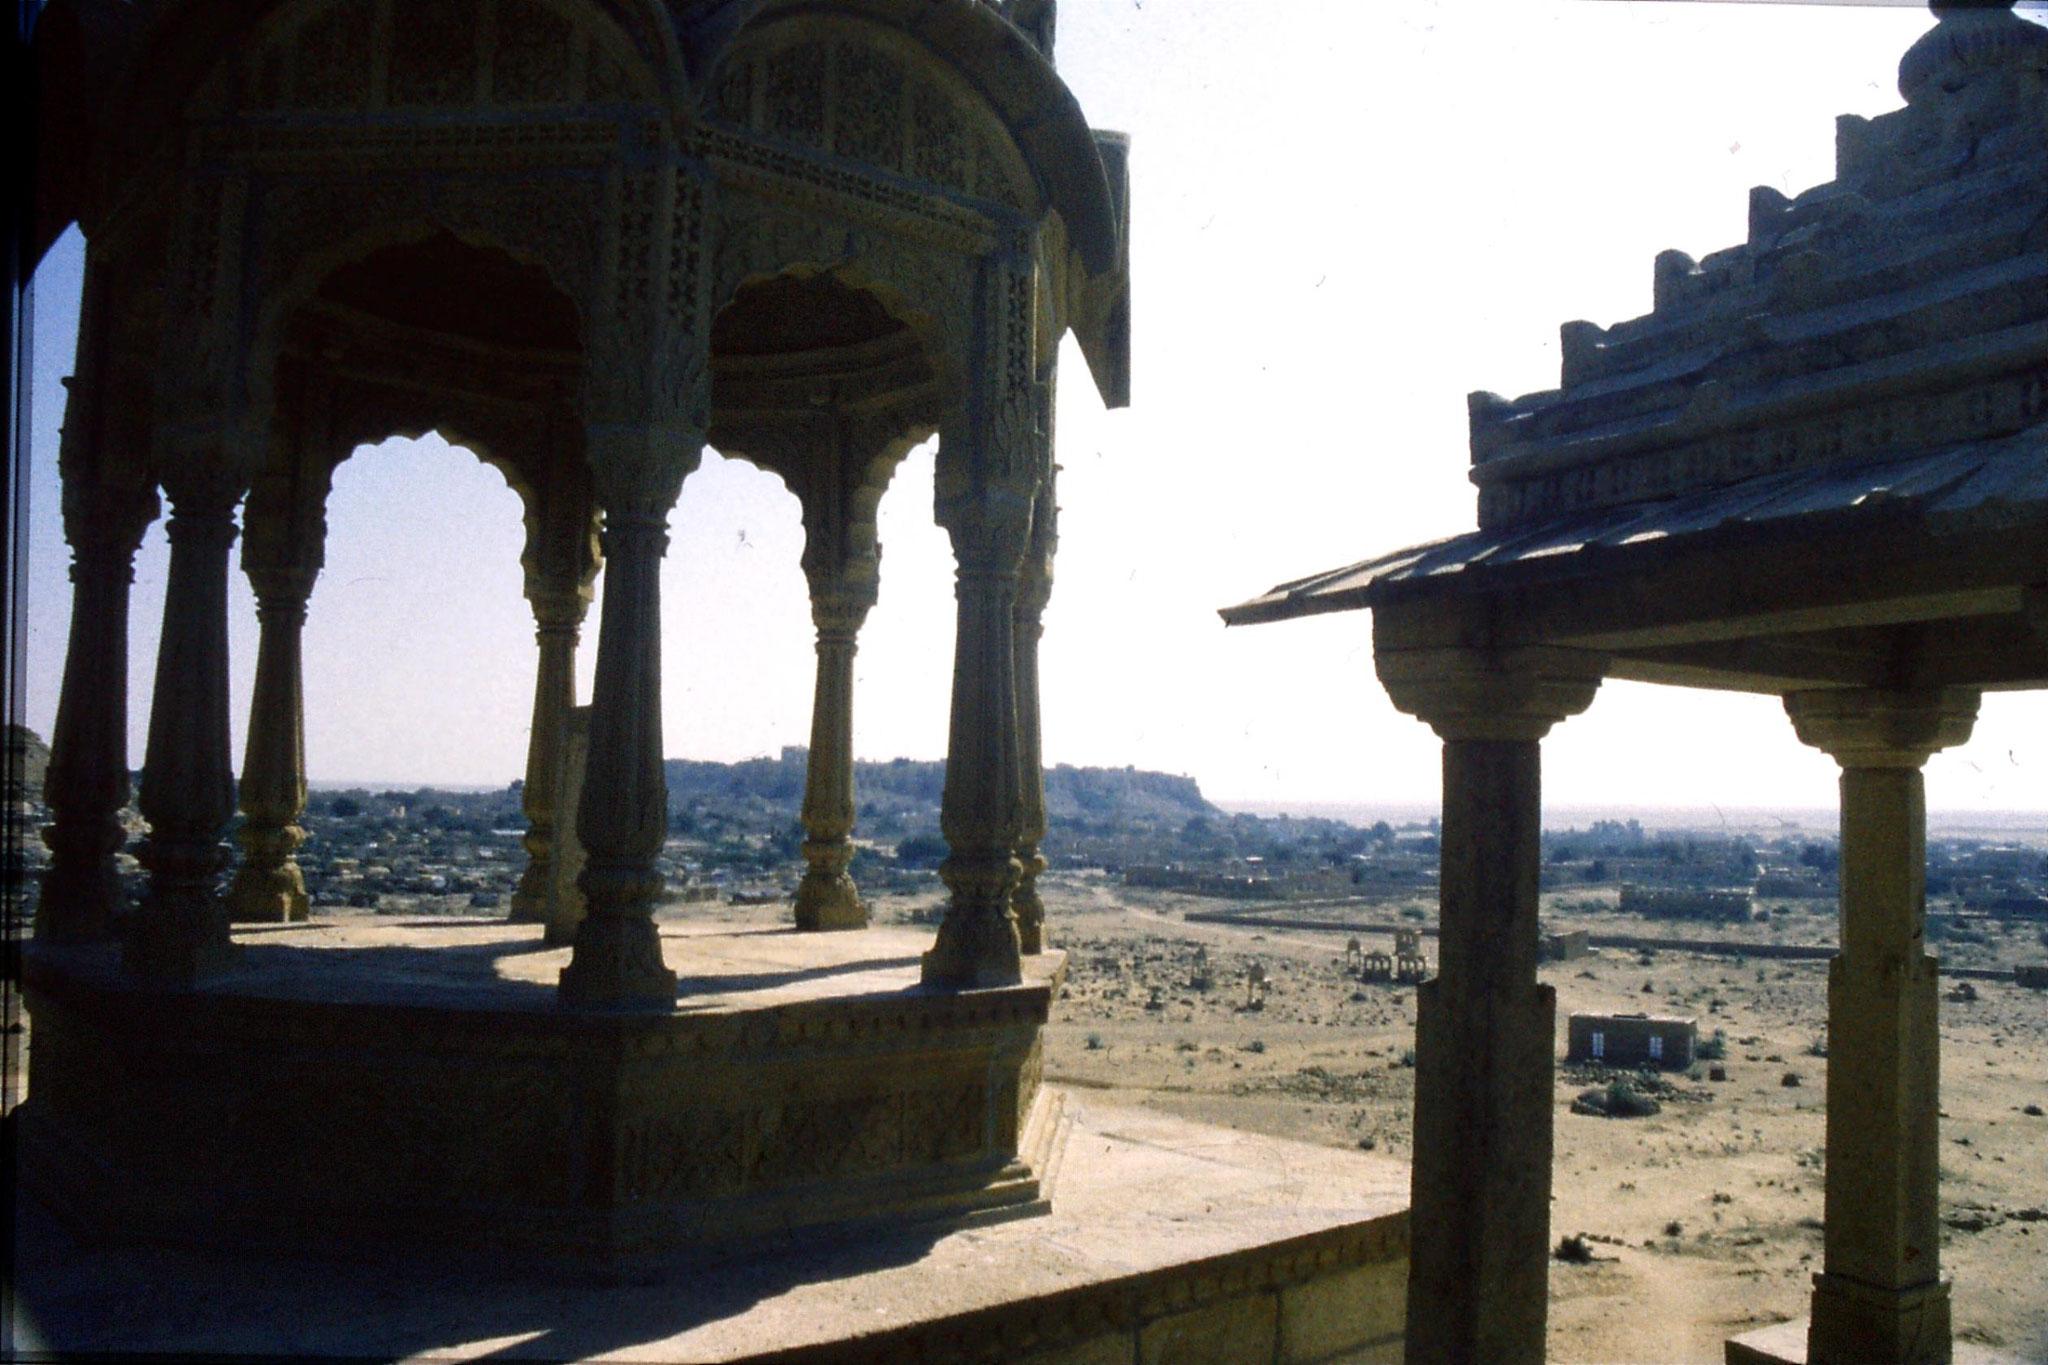 30/11/1989: 15: Jaisalmer, ruins NW of old city